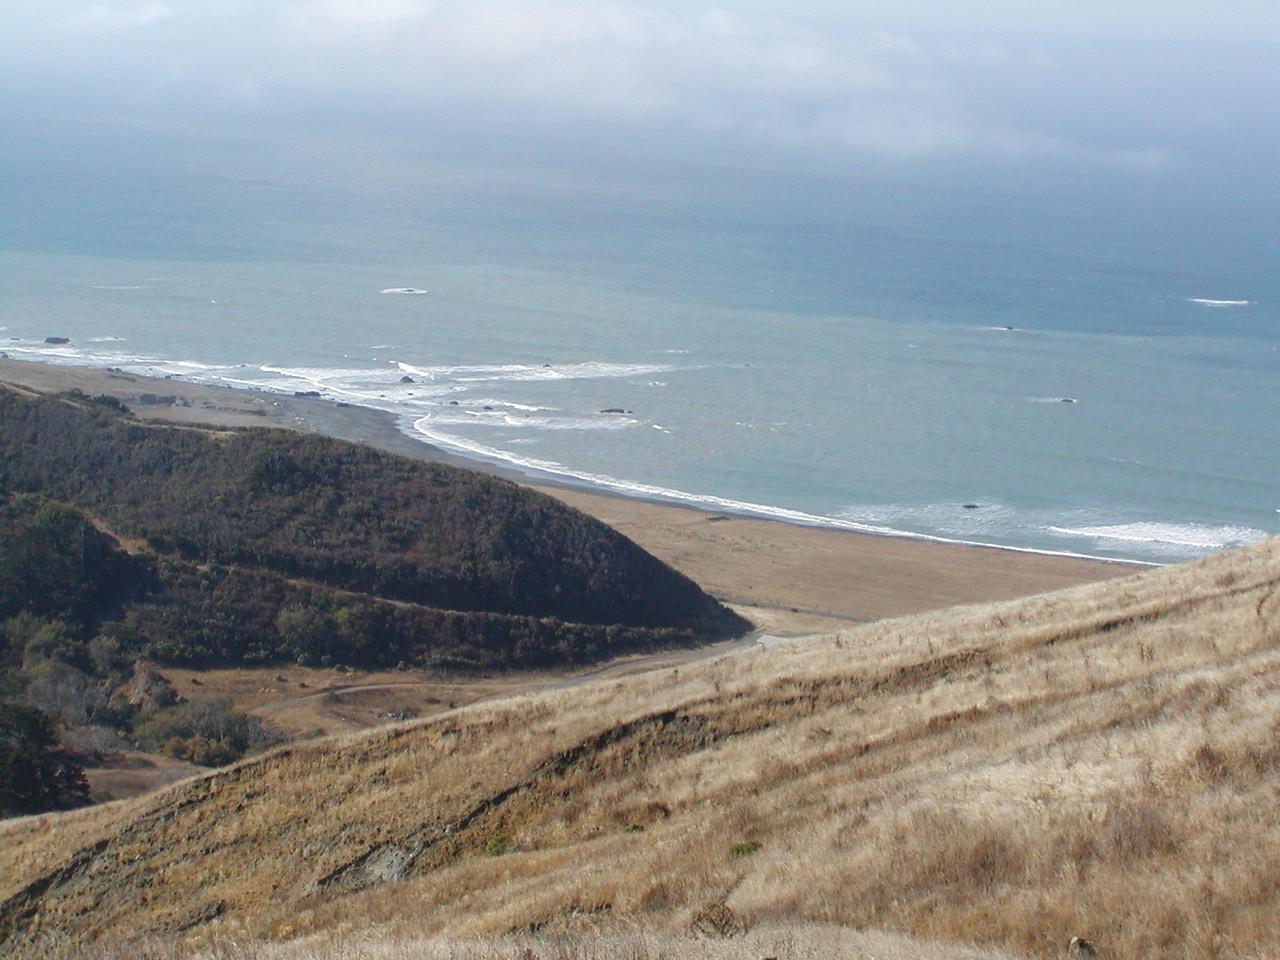 We Found the Lost Coast